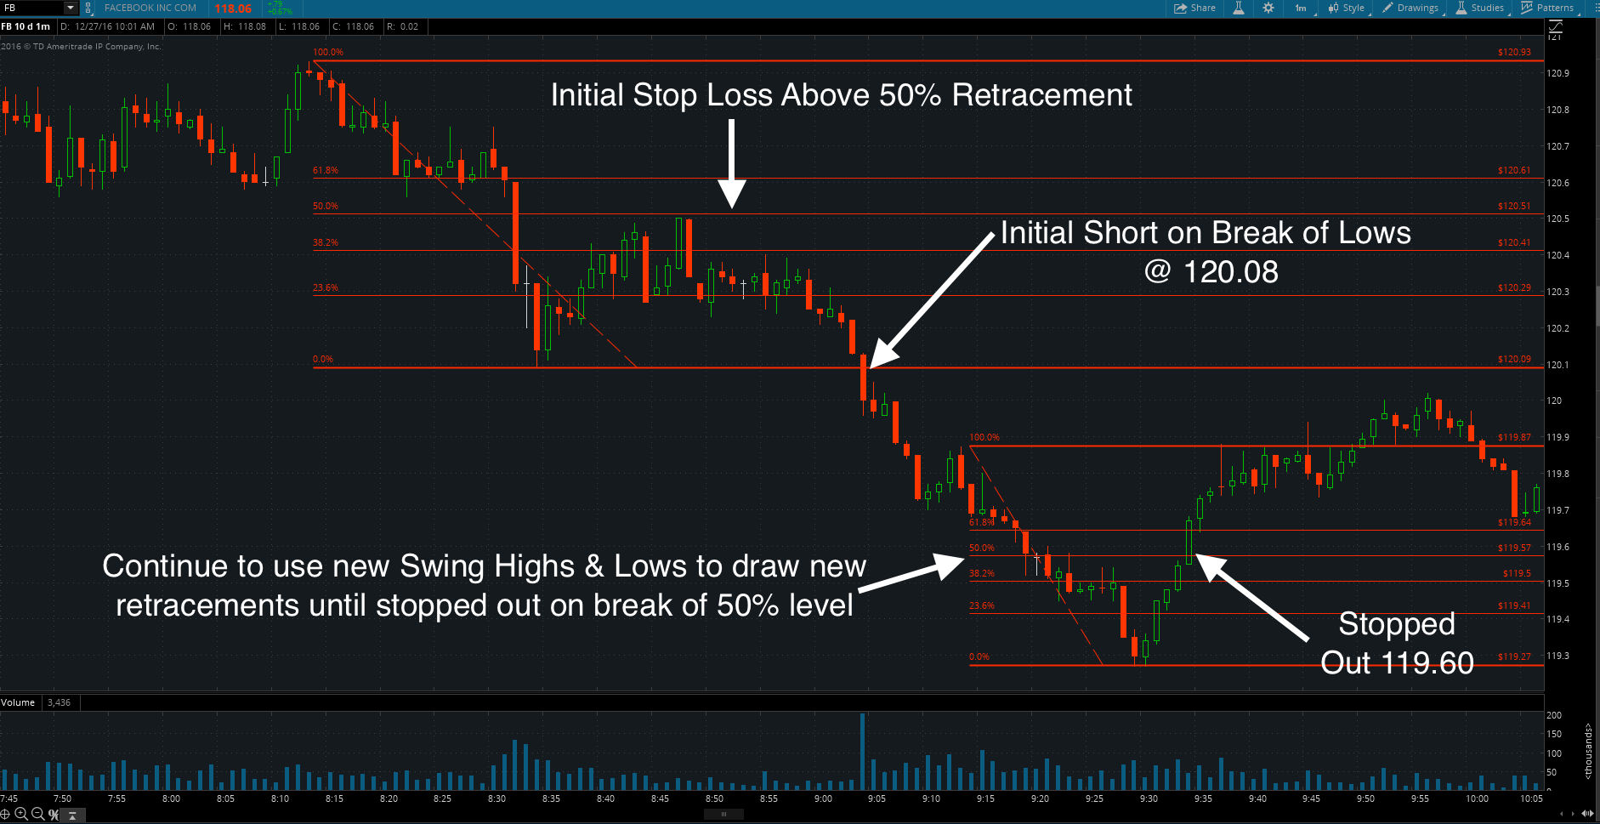 Fibonacci Retracements for Stop Loss